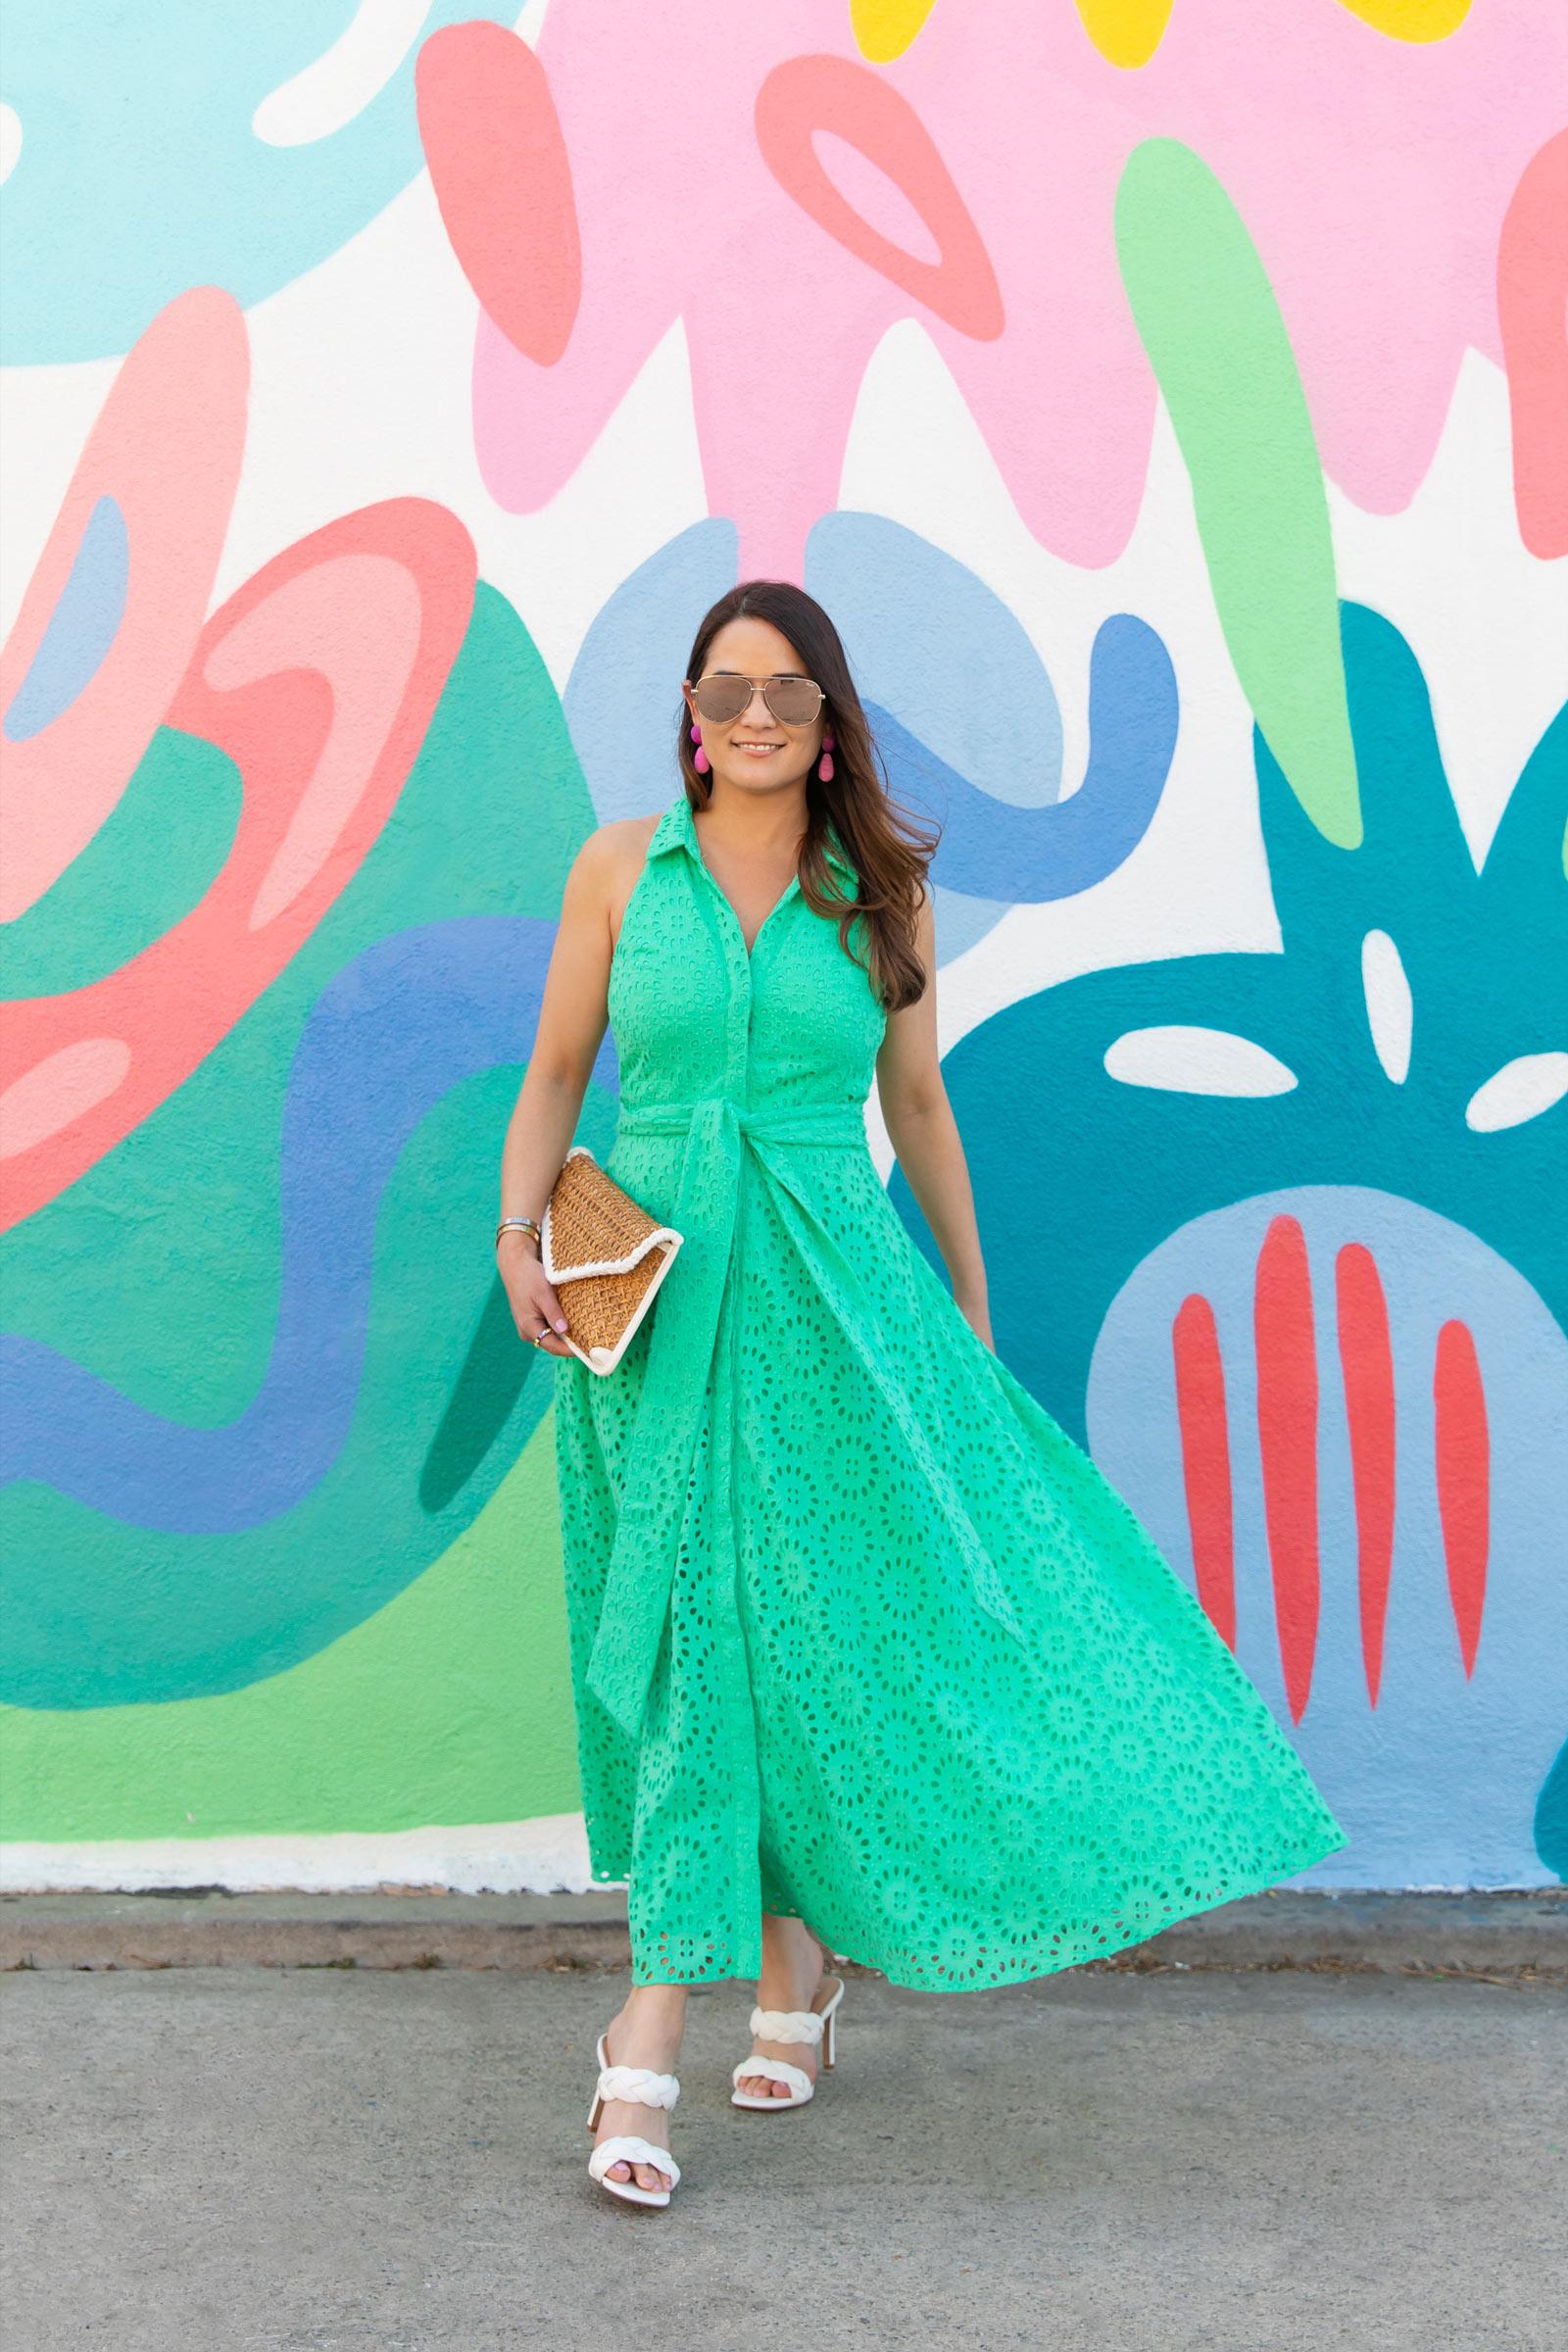 Lilly Pulitzer Chrisella Eyelet Dress